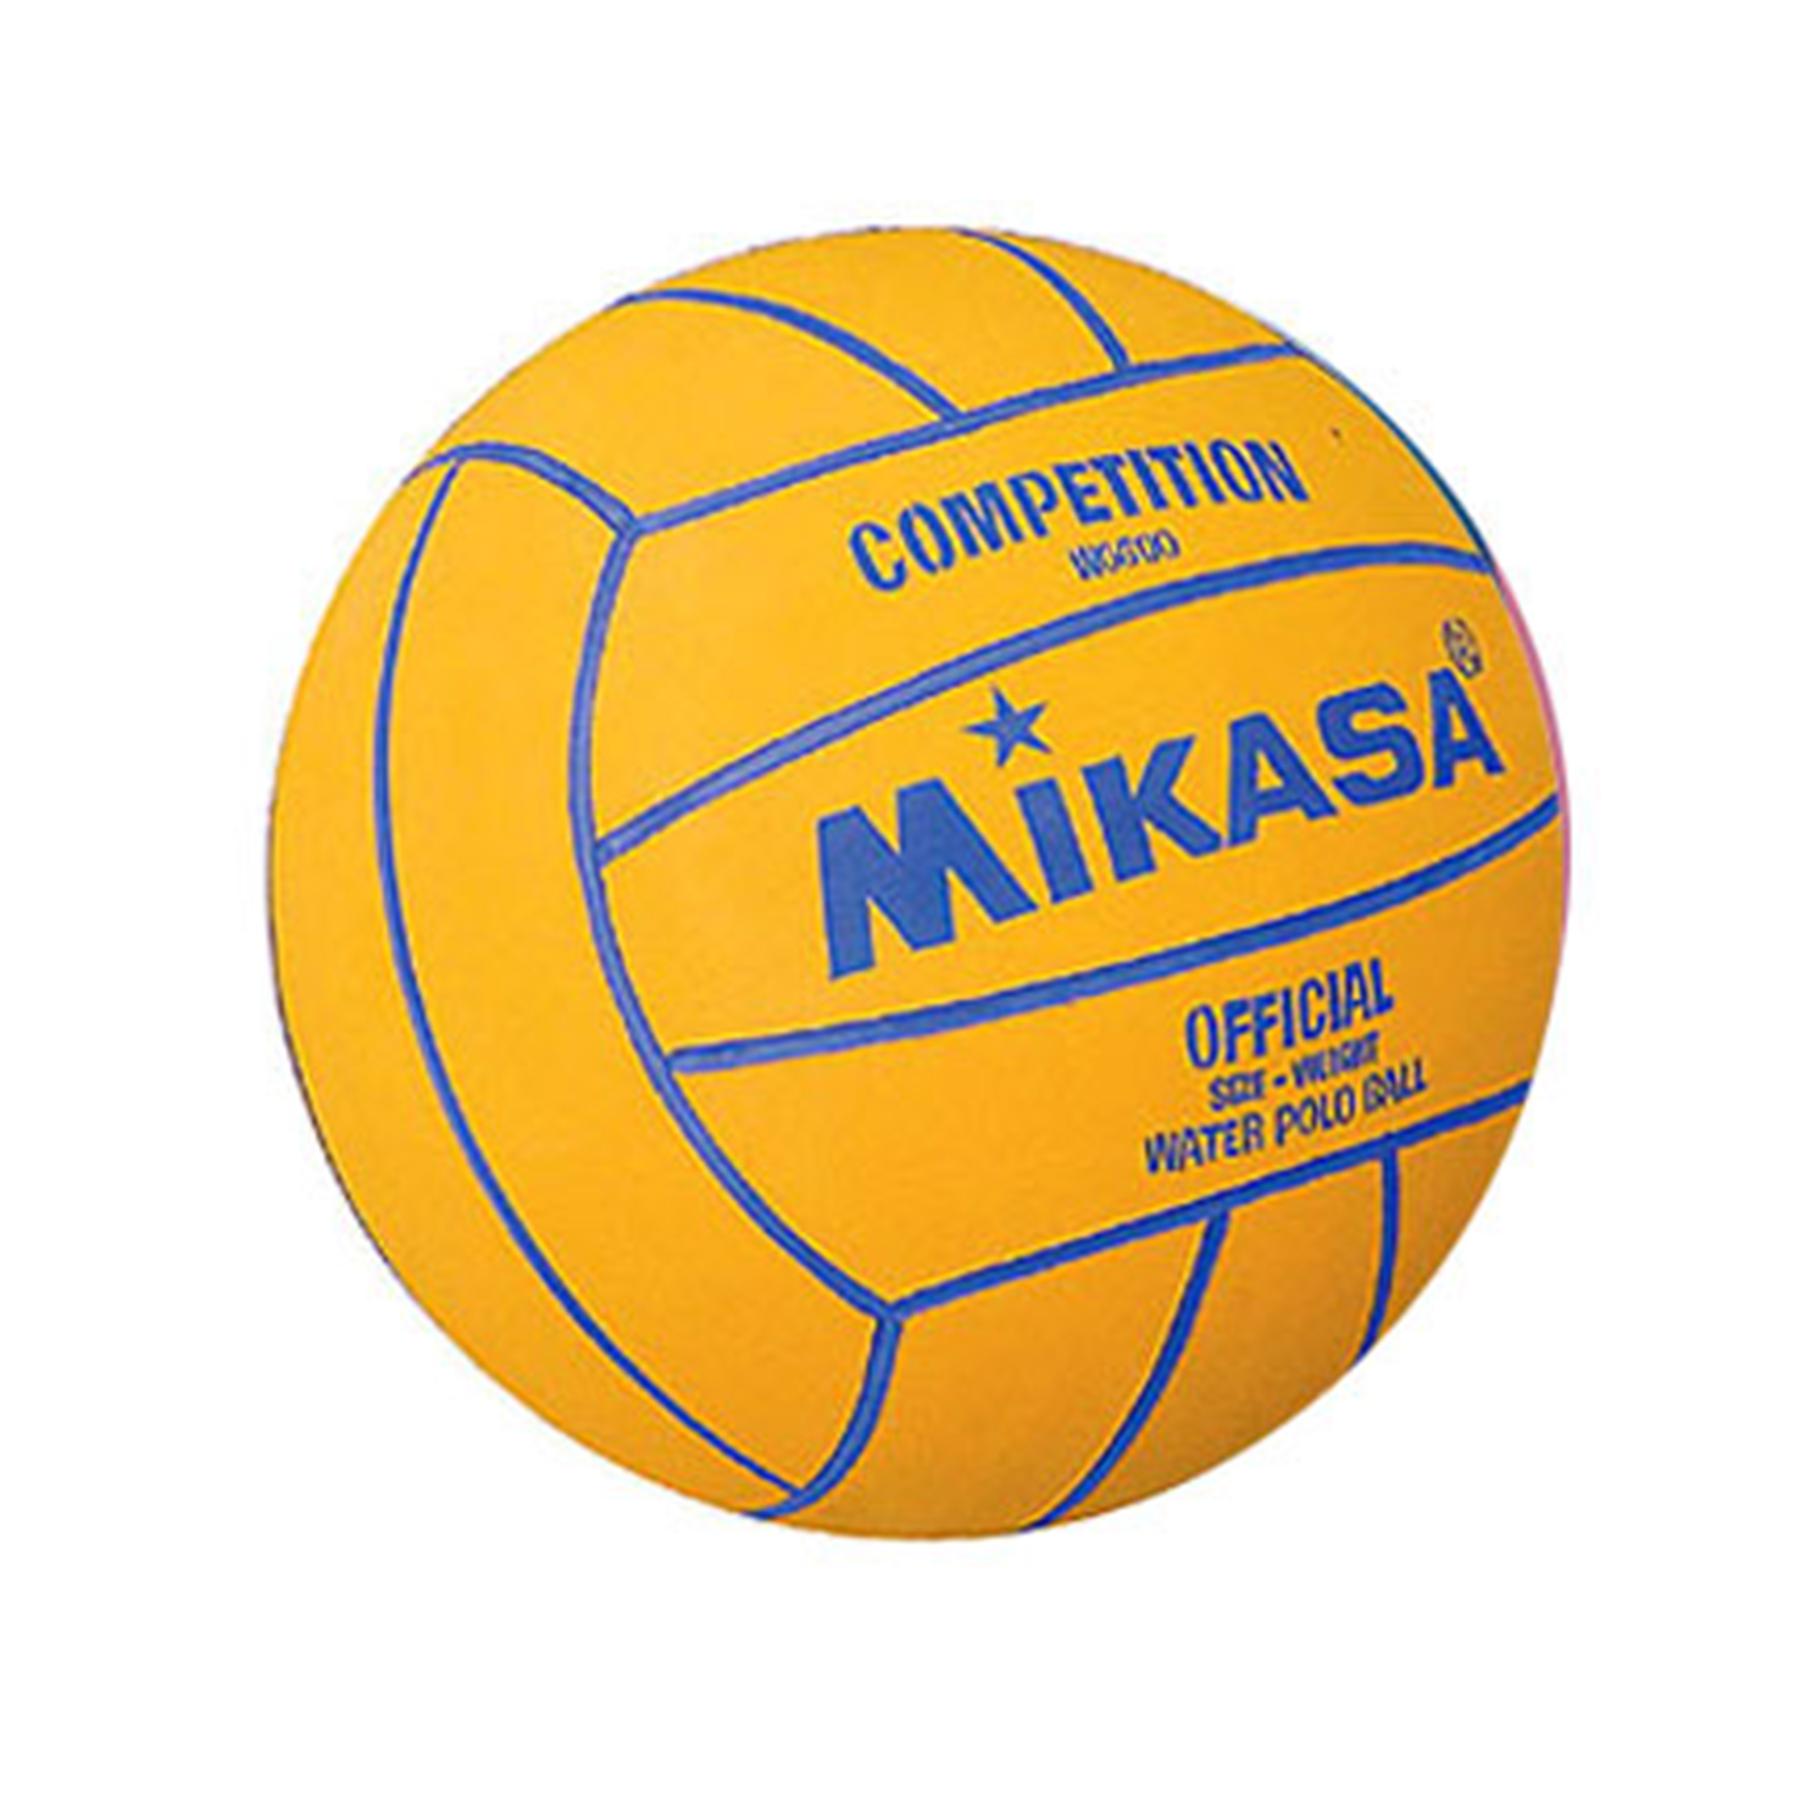 Мяч водное поло Микаса мужской W6600